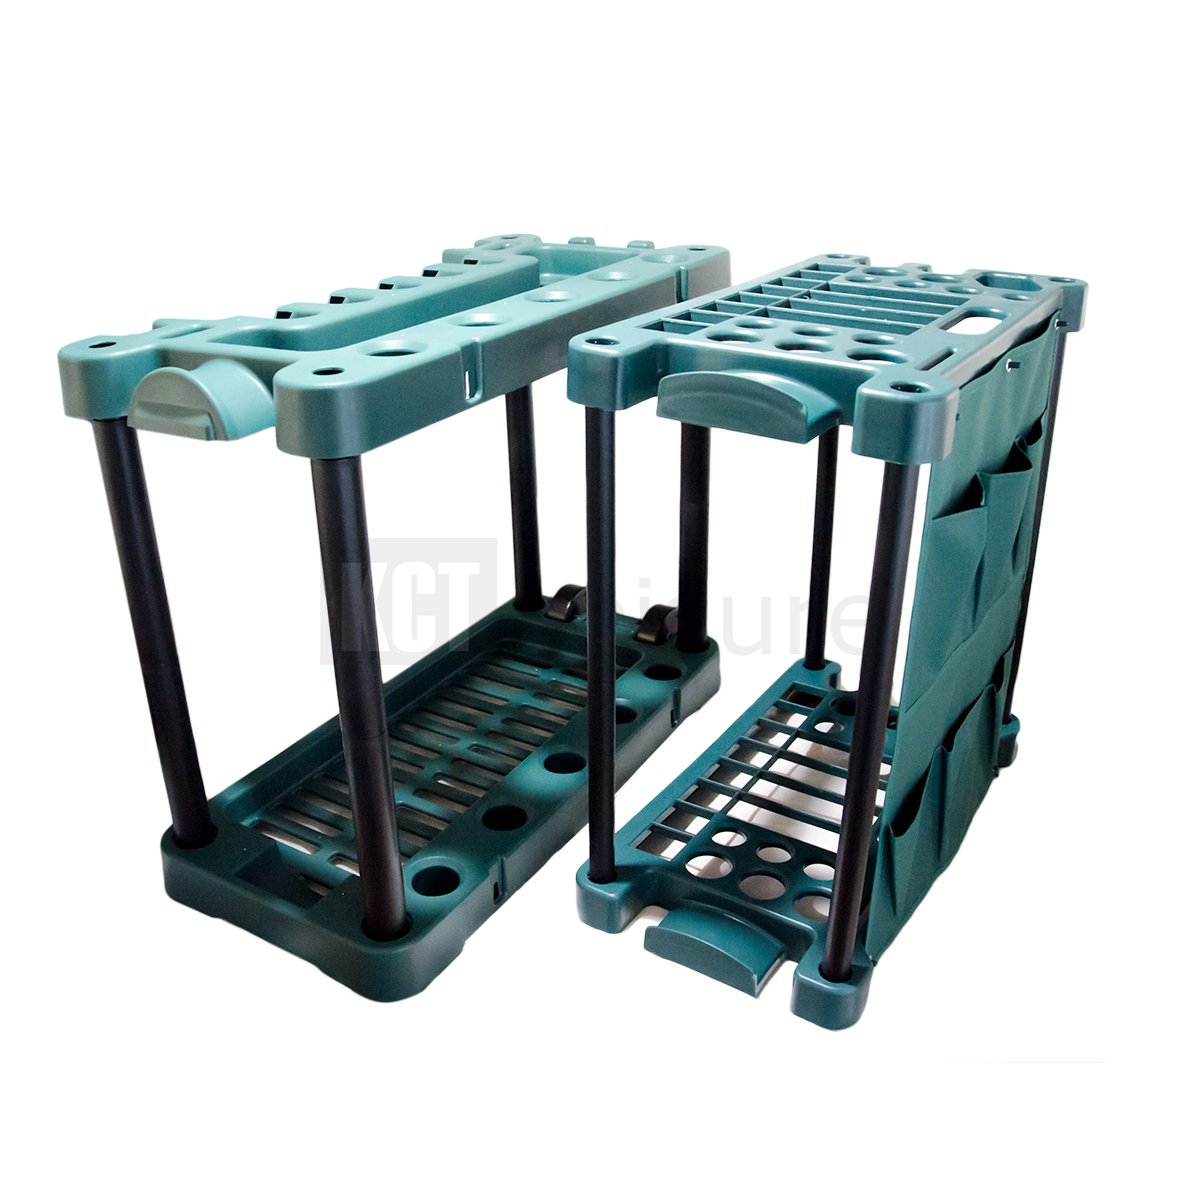 Garden tool trolley rack organiser gardening storage for Gardening tools organizer